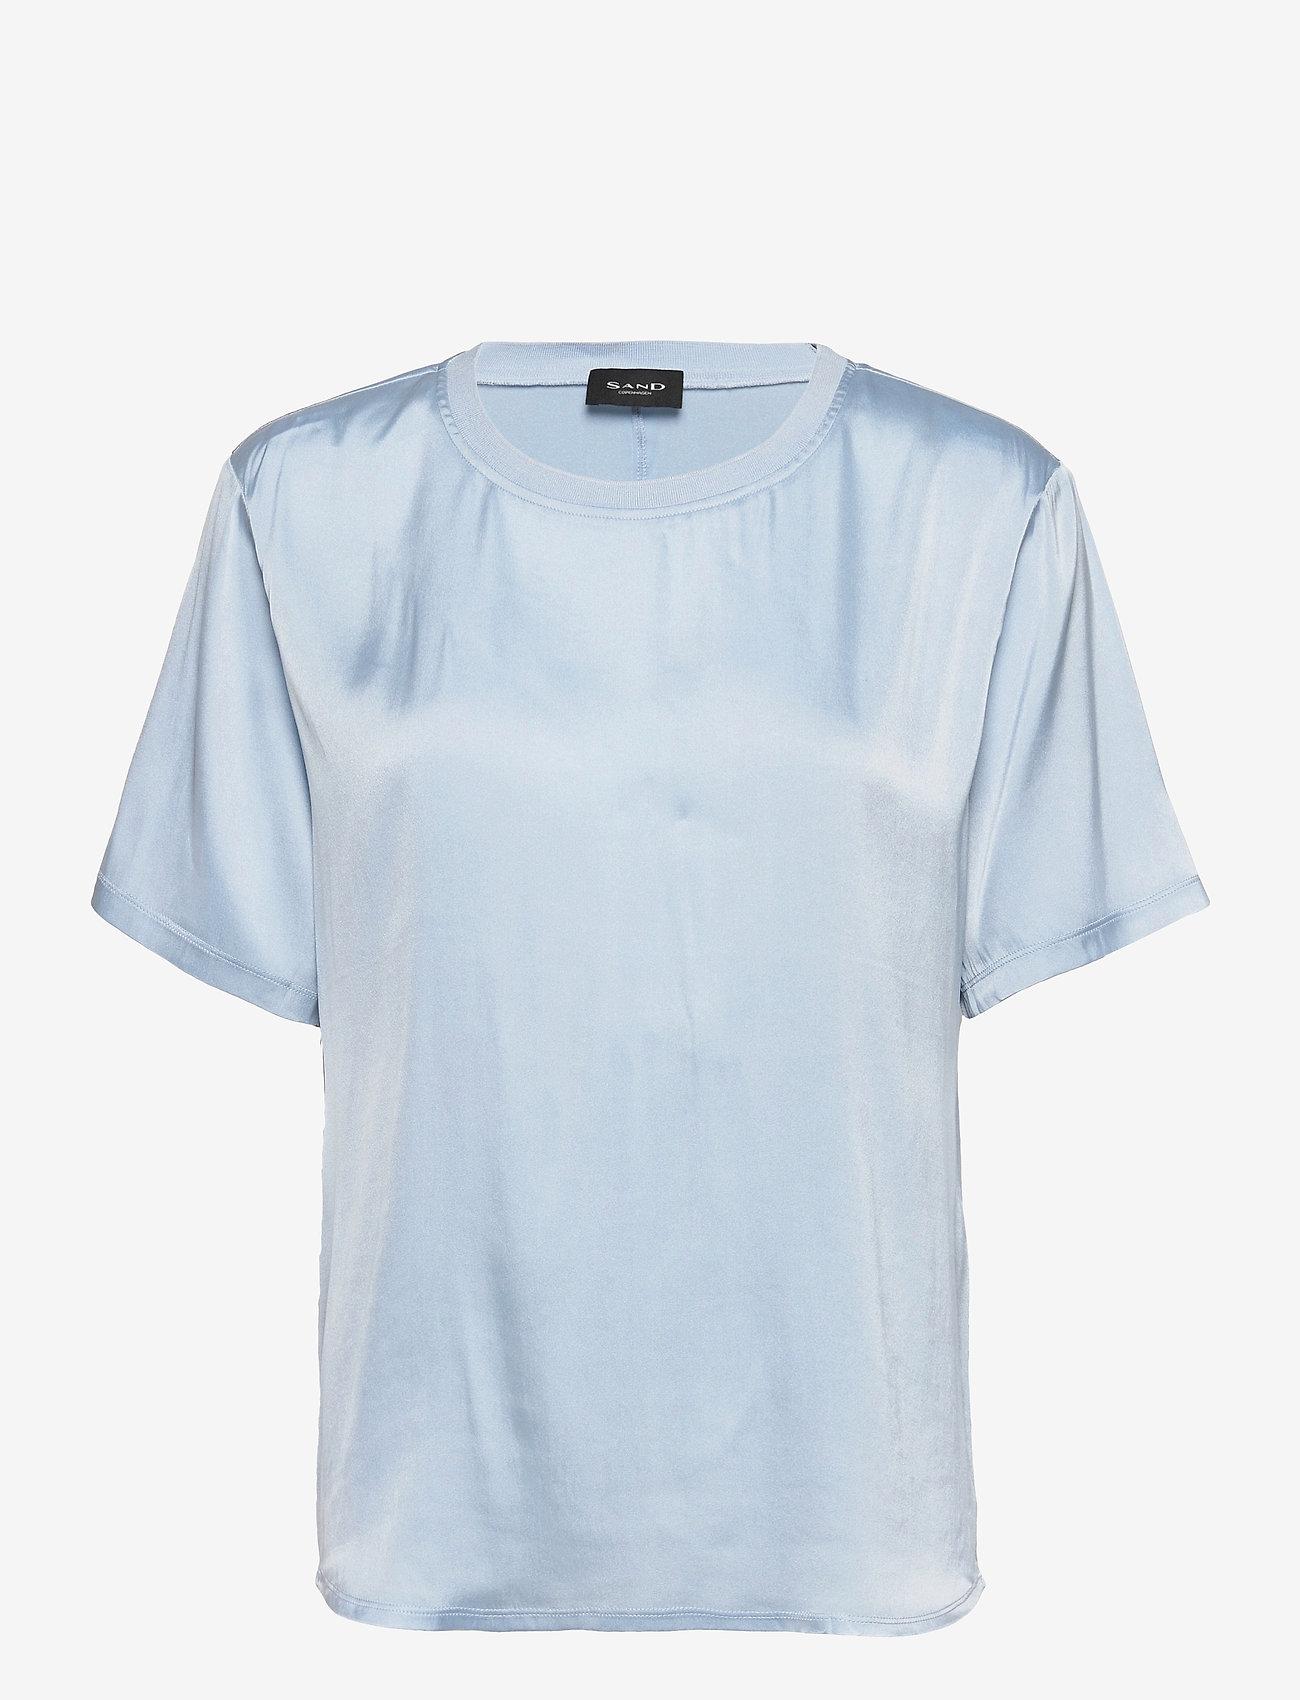 SAND - 3176 SW - Minerva - blouses met korte mouwen - light blue - 0